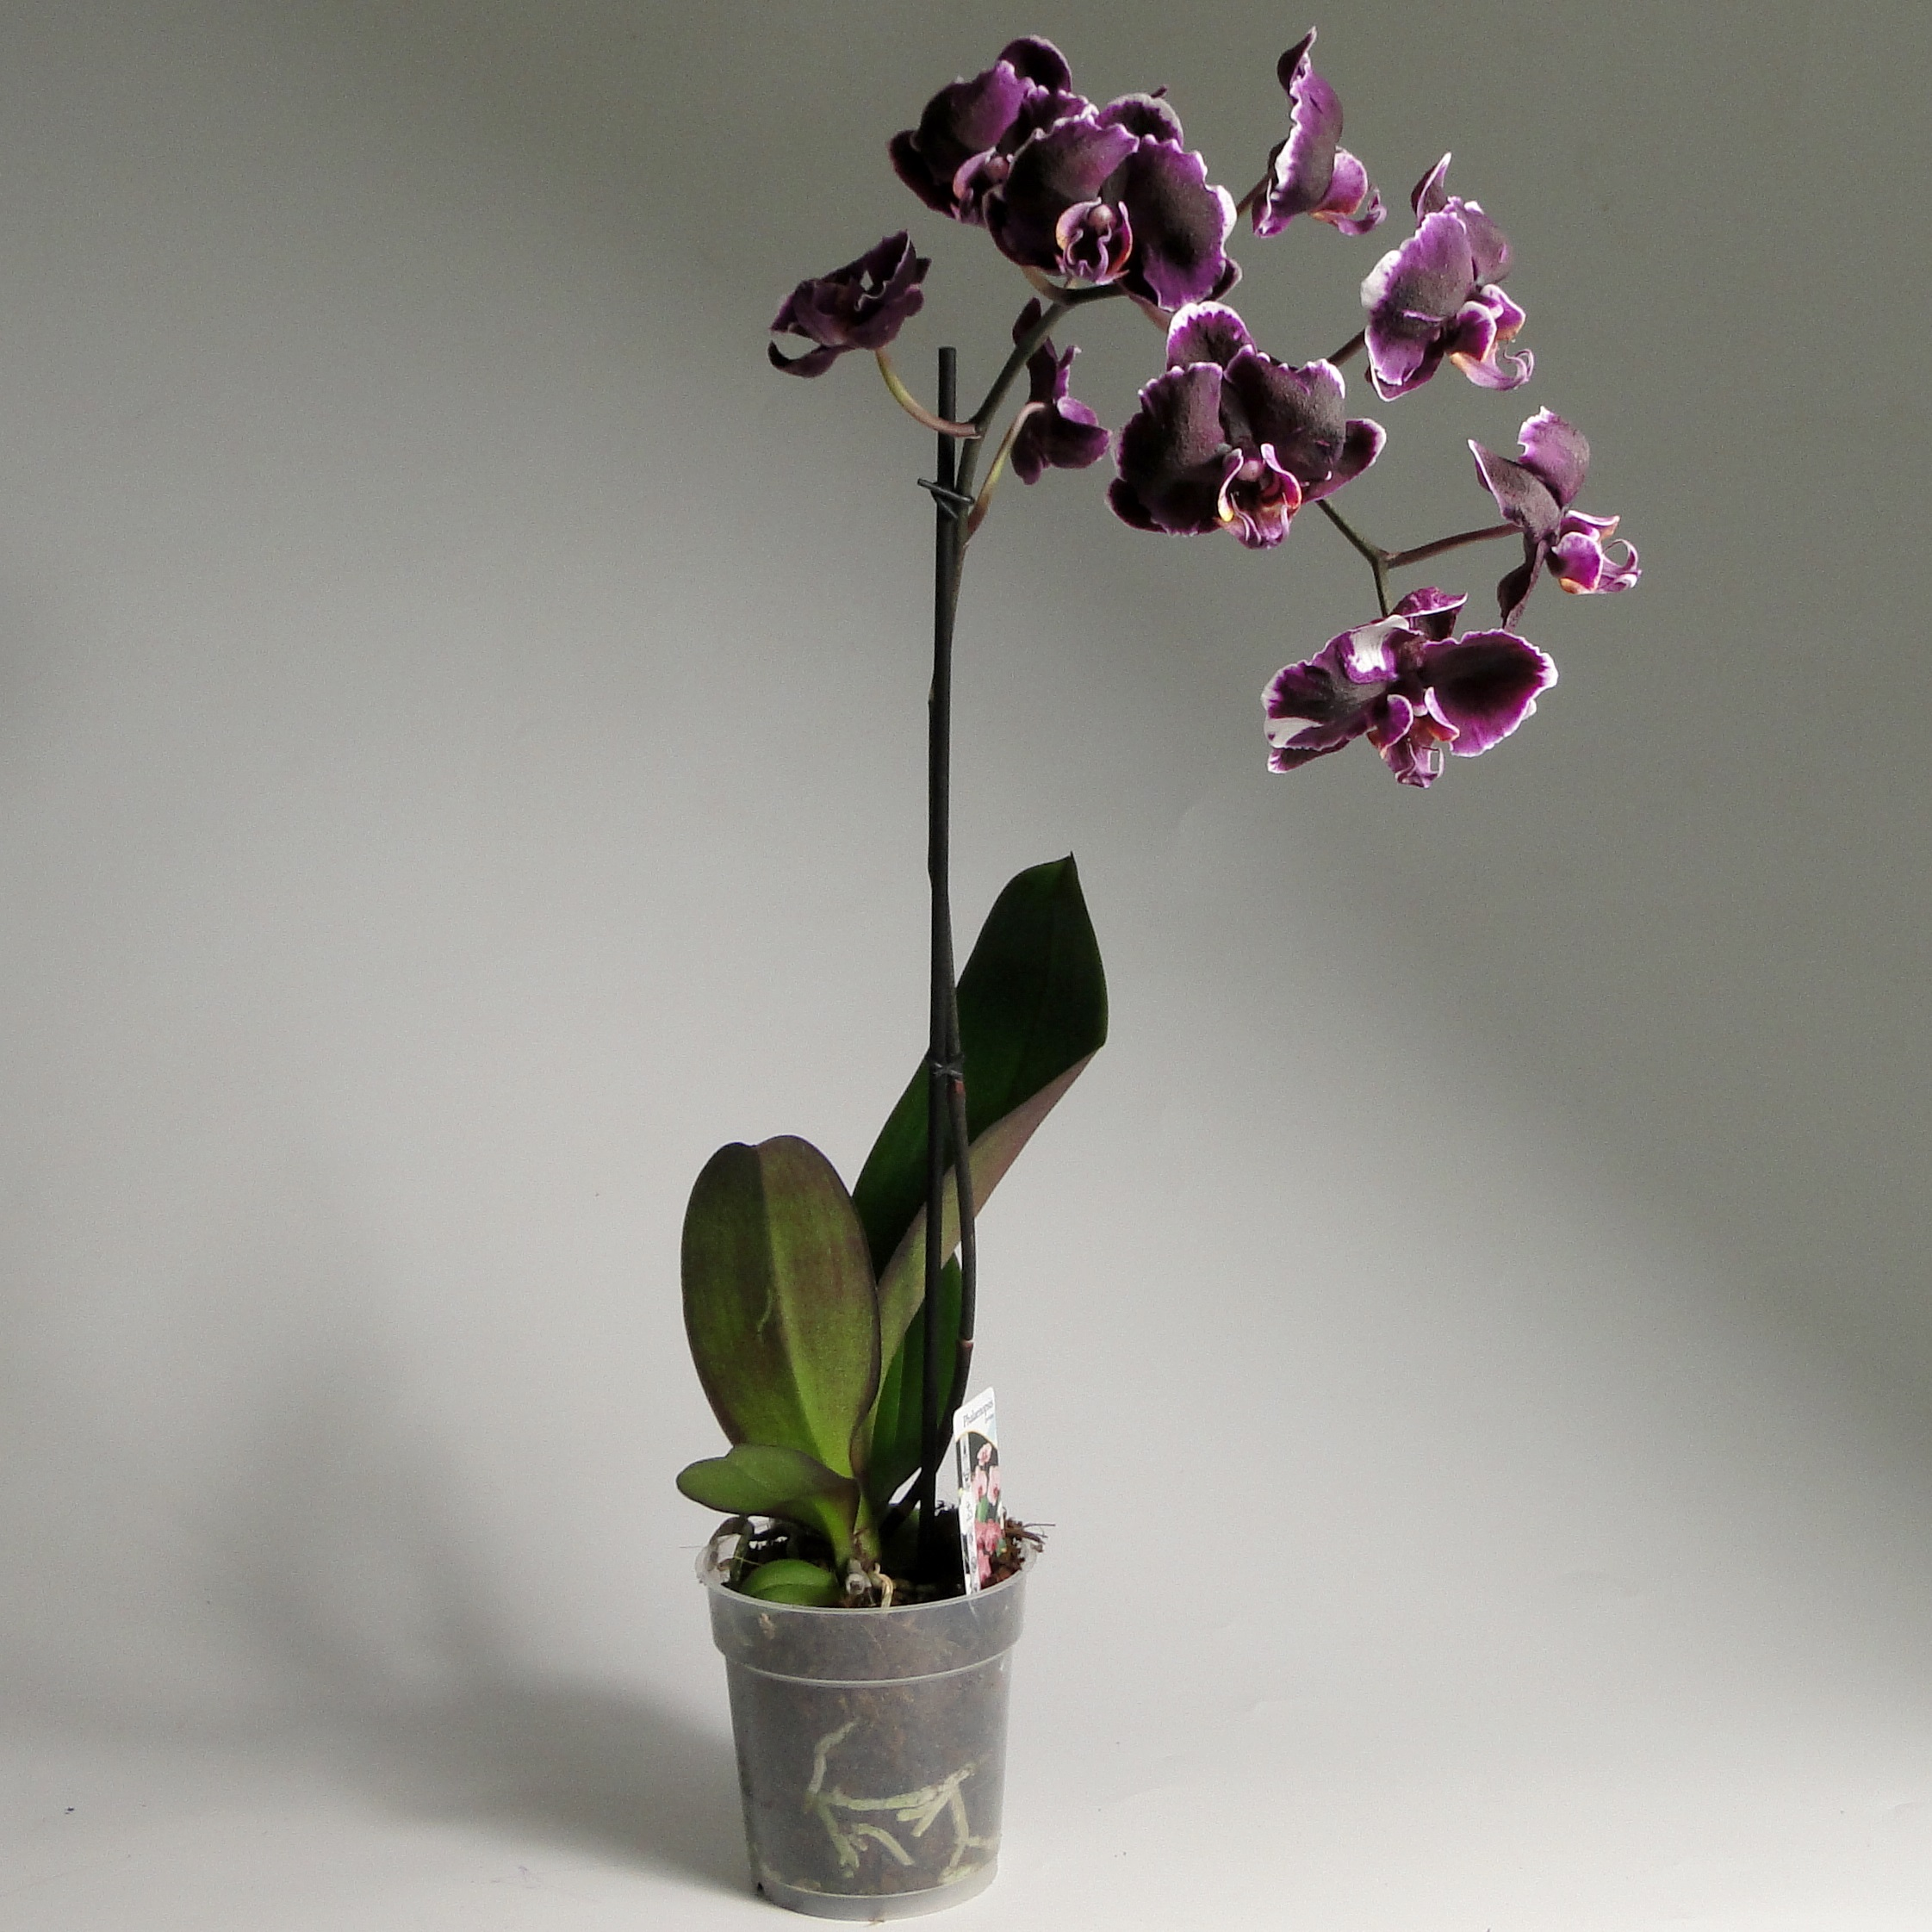 Чёрная орхидея фаленопсис Блэк Берд